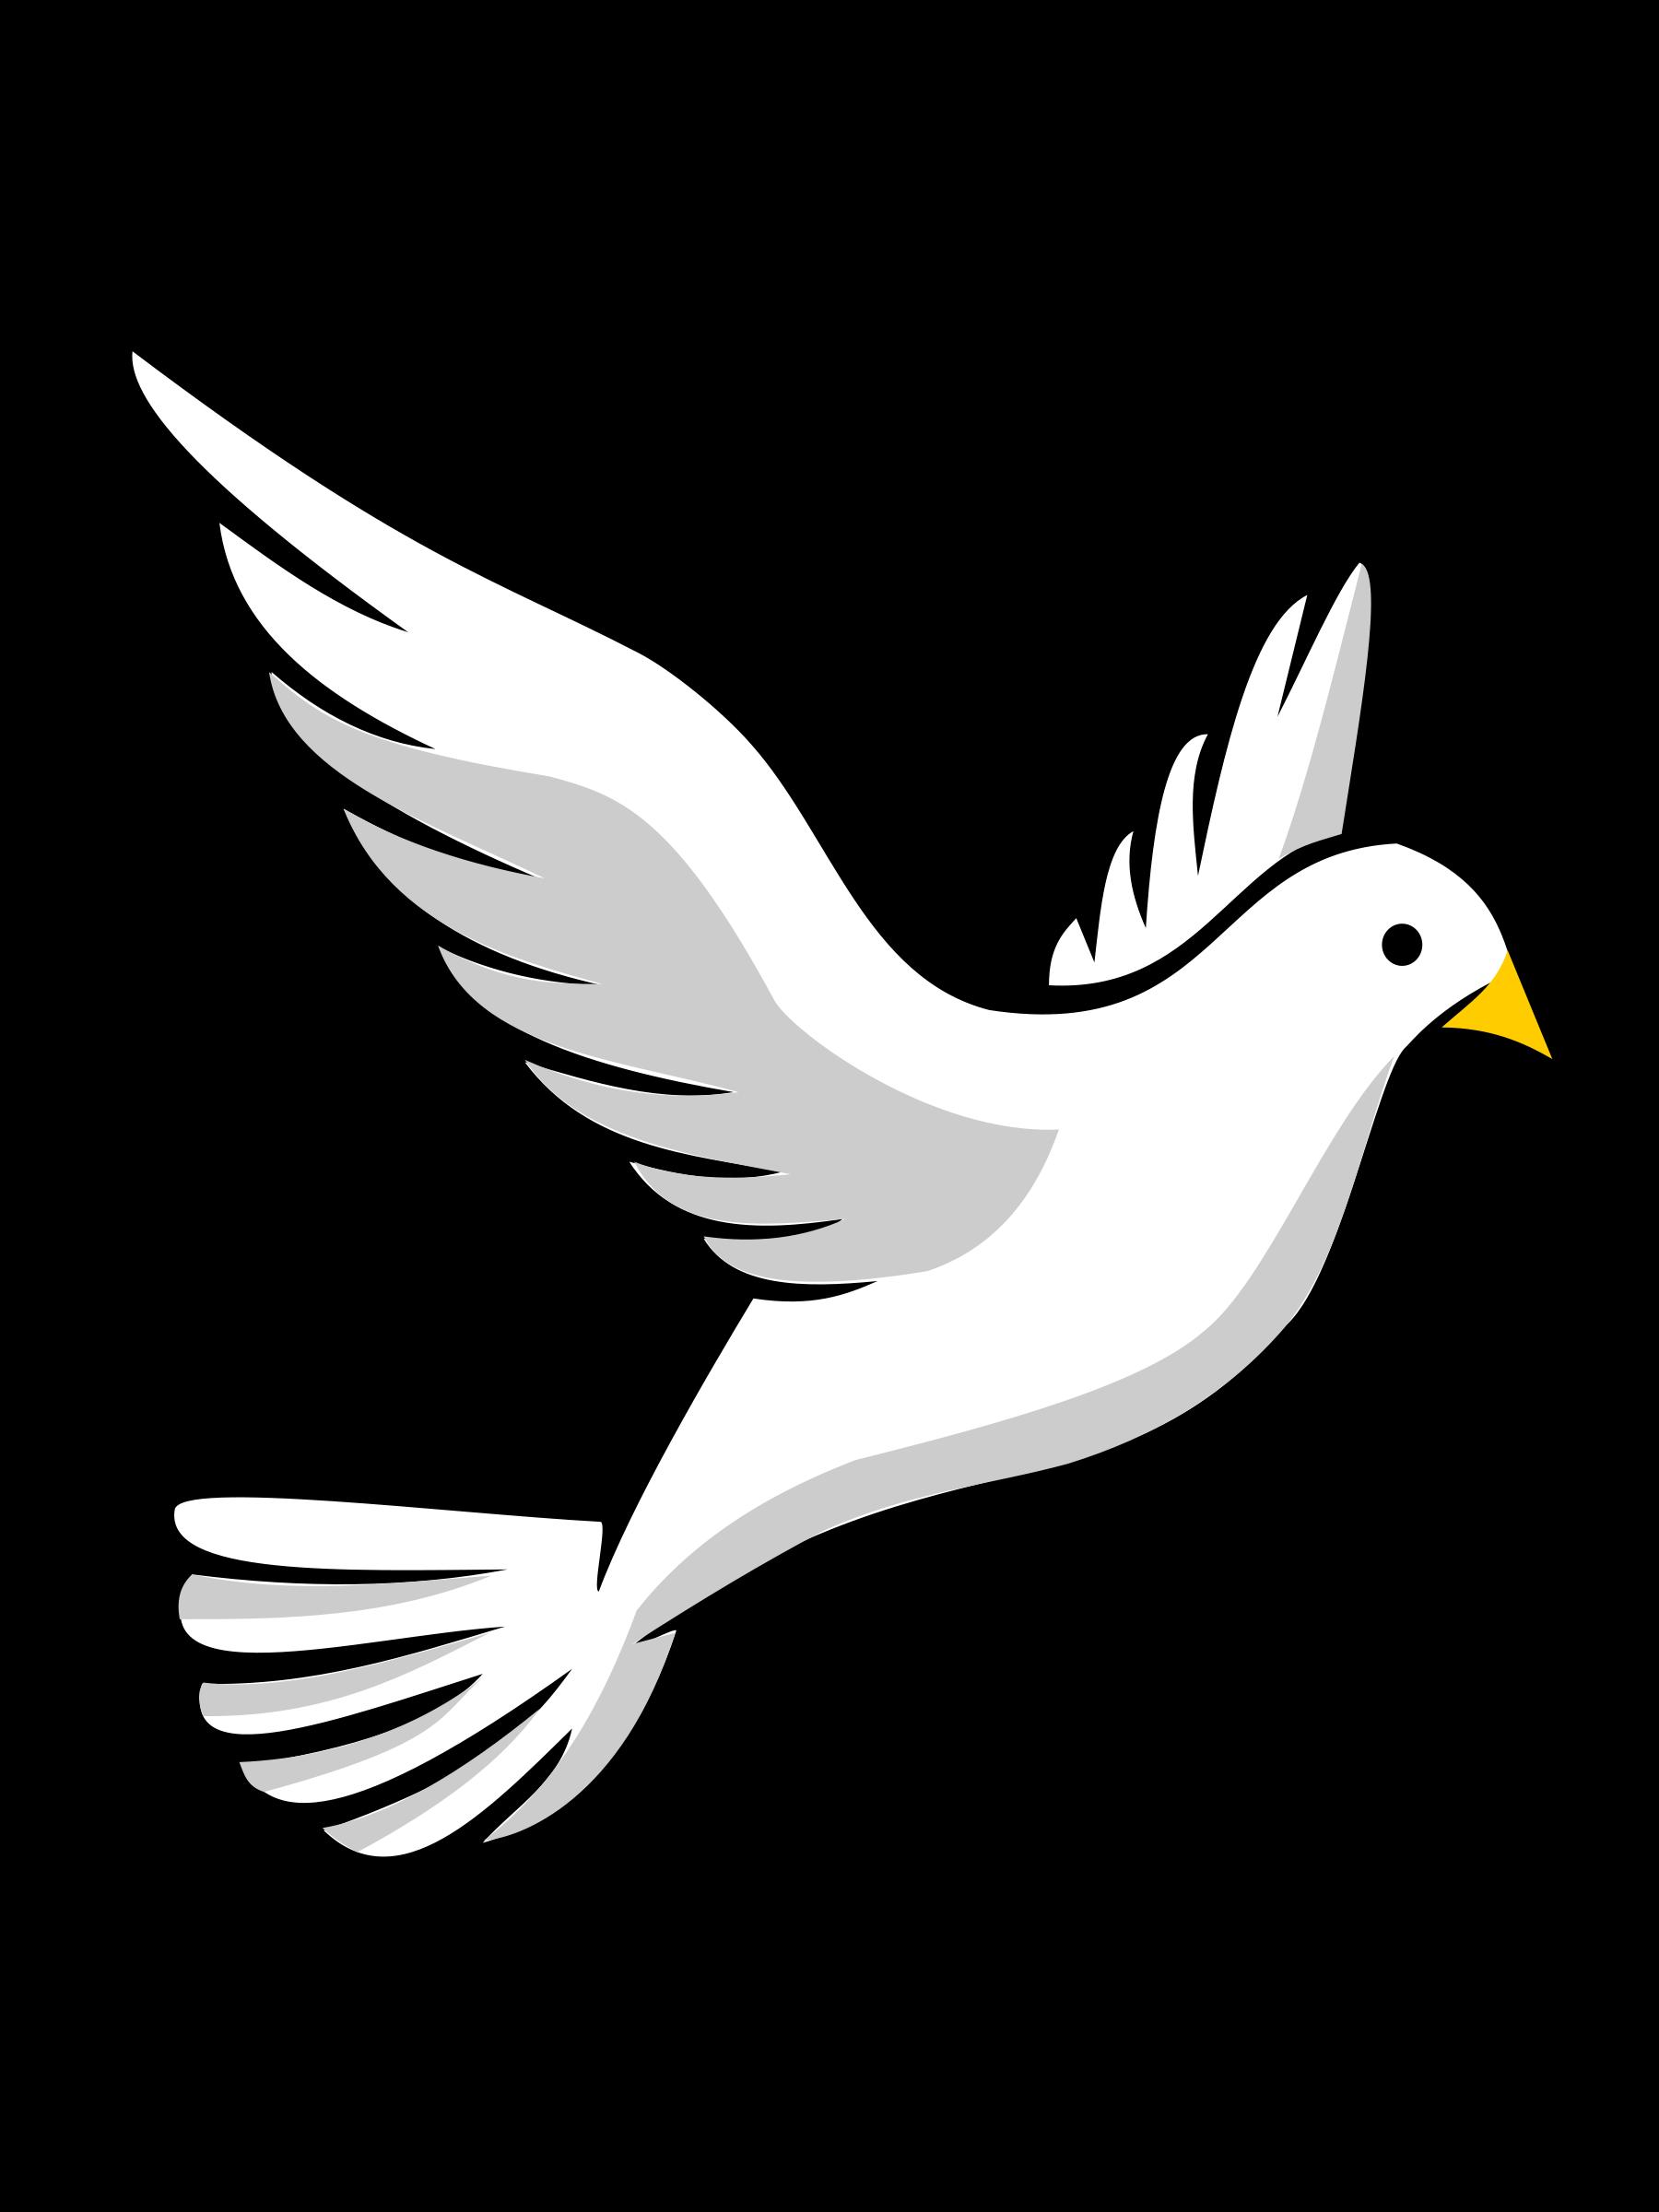 holy spirit dove clipart - PNG Holy Spirit